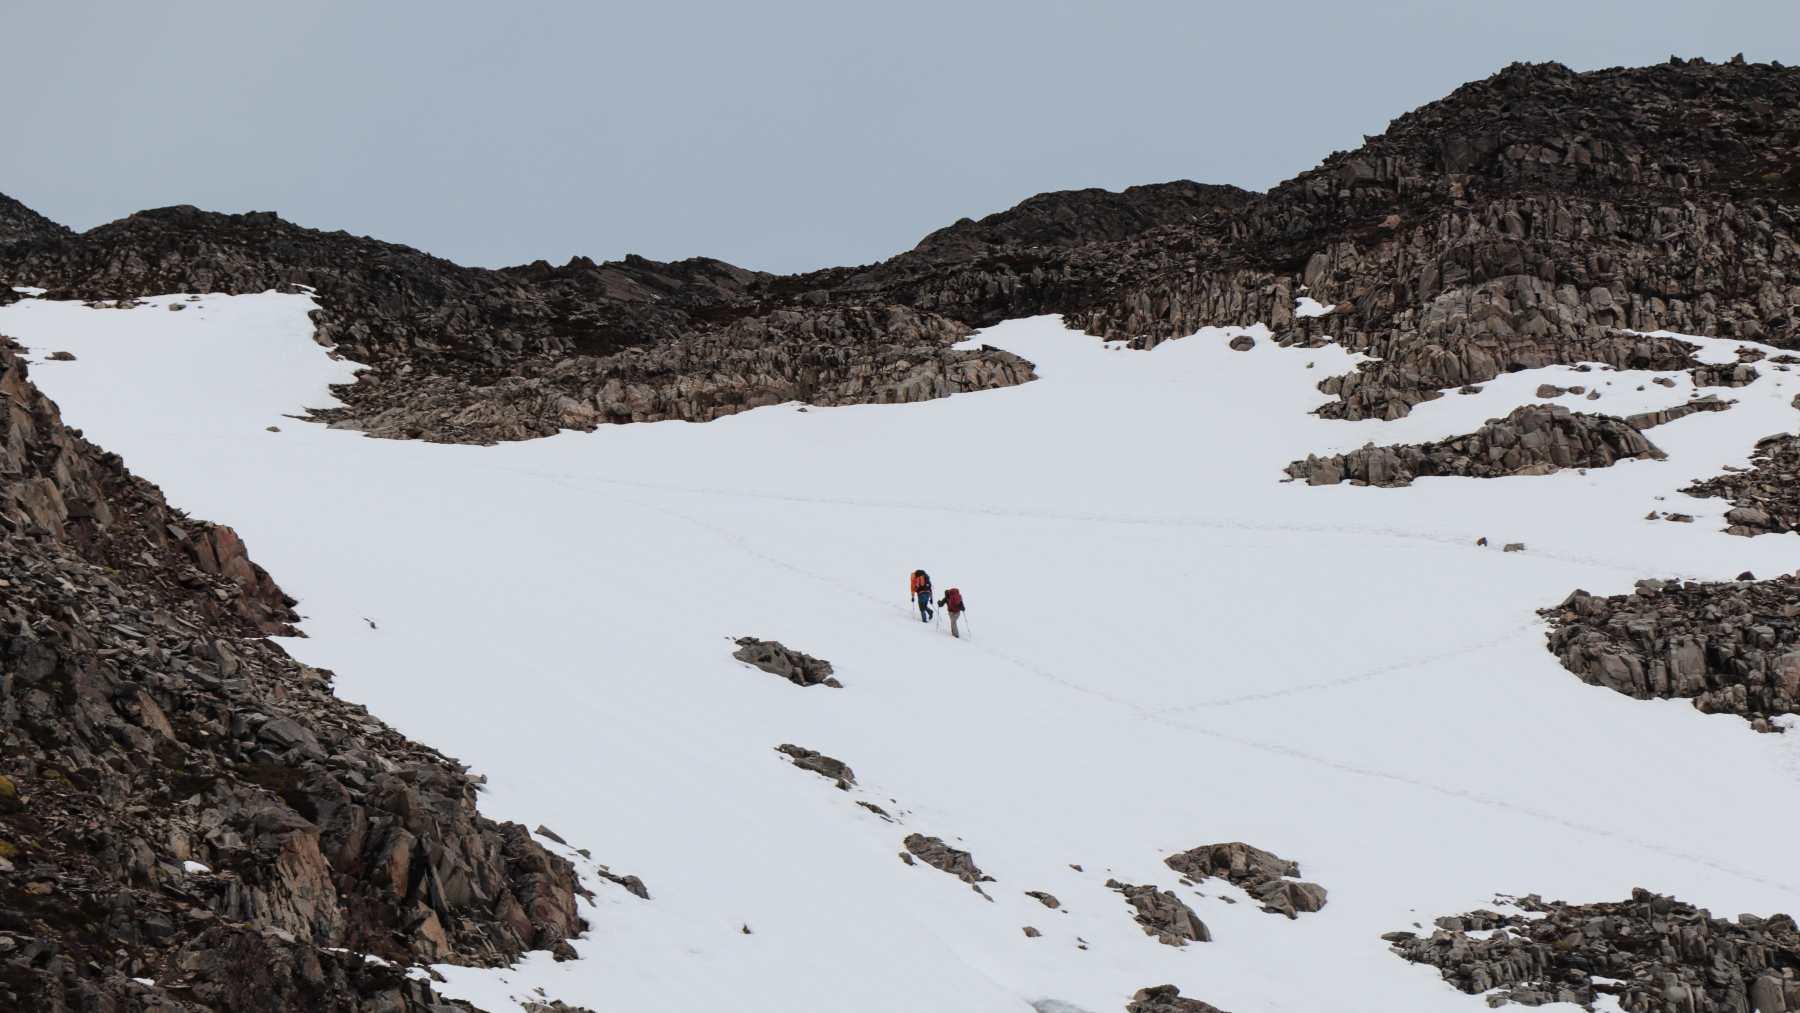 Parque Nacional Torres del Paine, en Chile